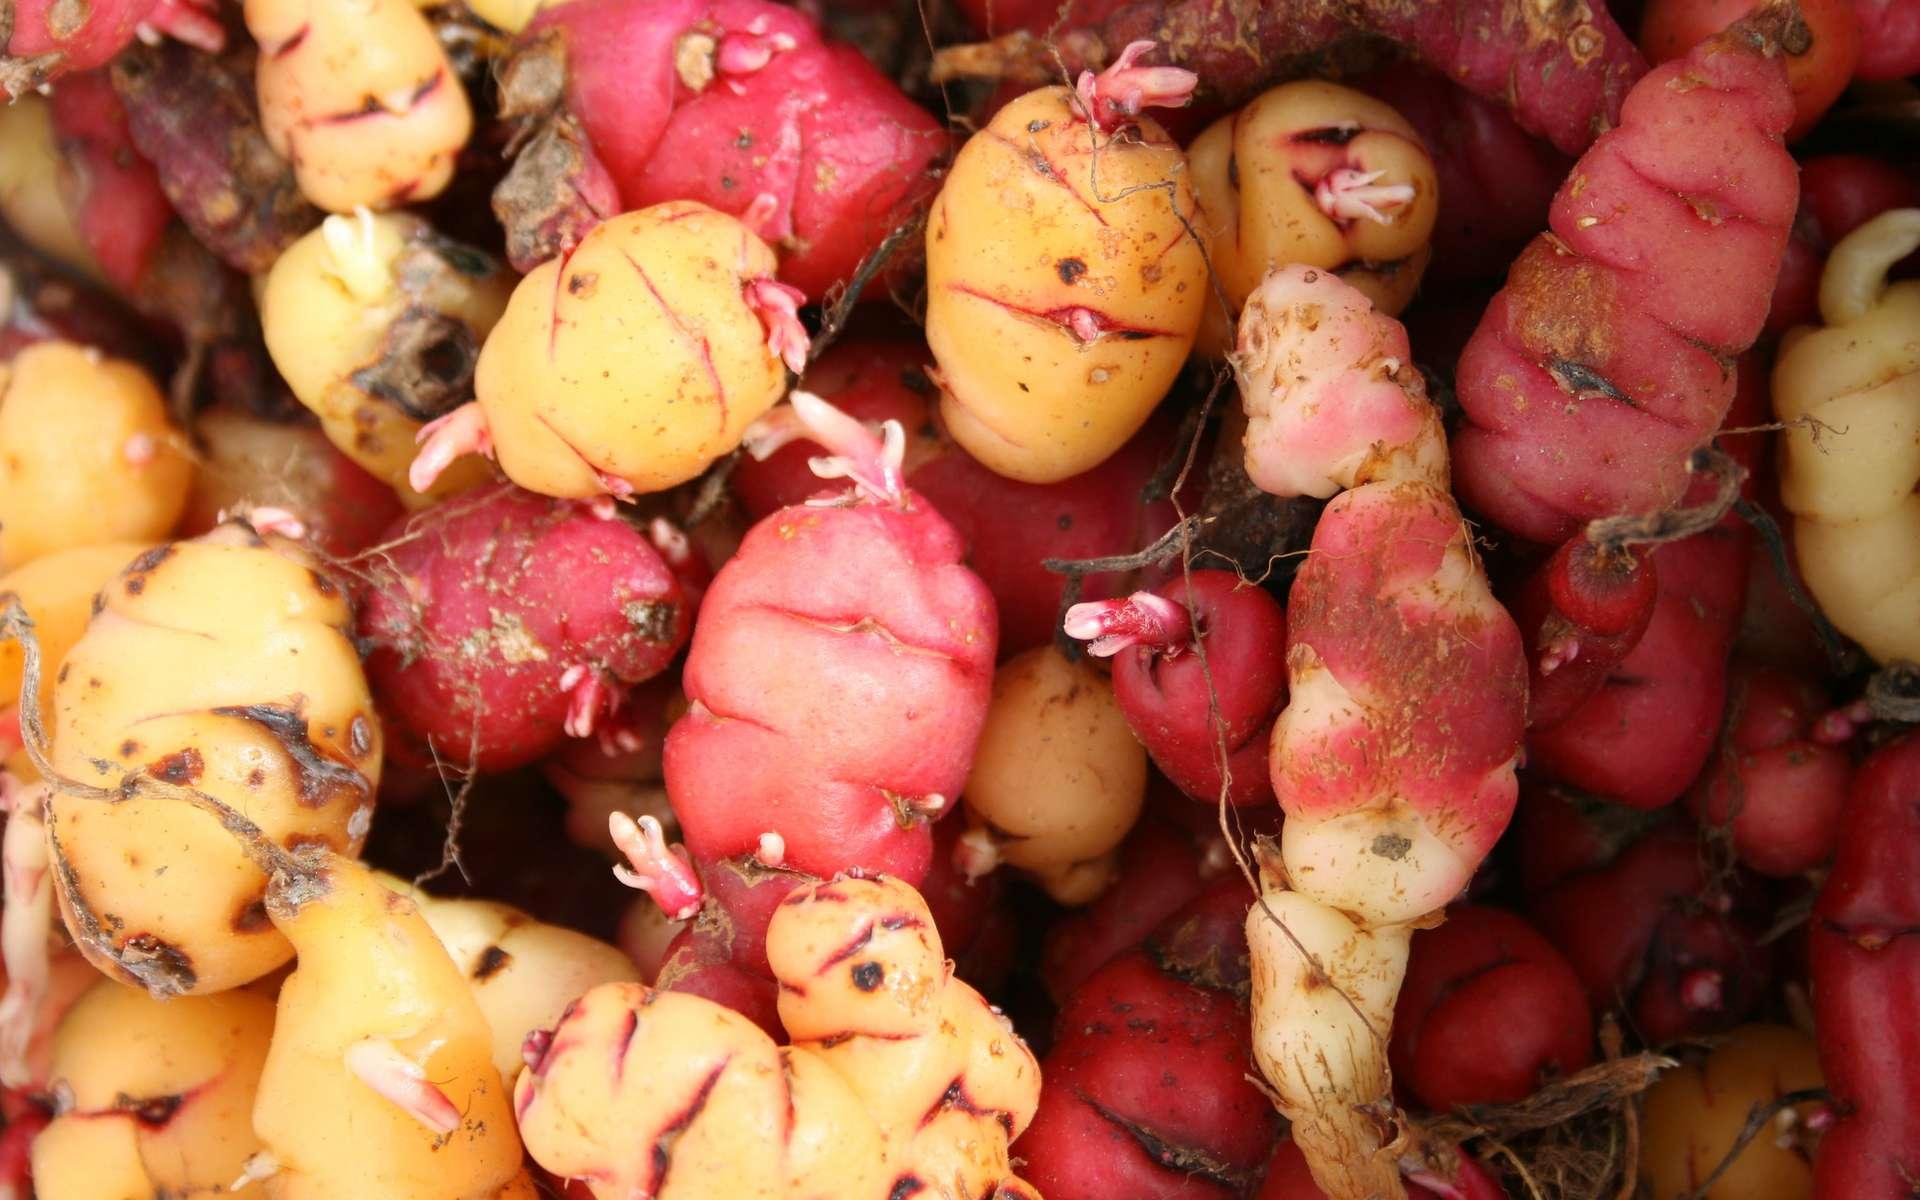 L'oca, une tubercule originaire du Pérou. © Emma Cooper, Flickr